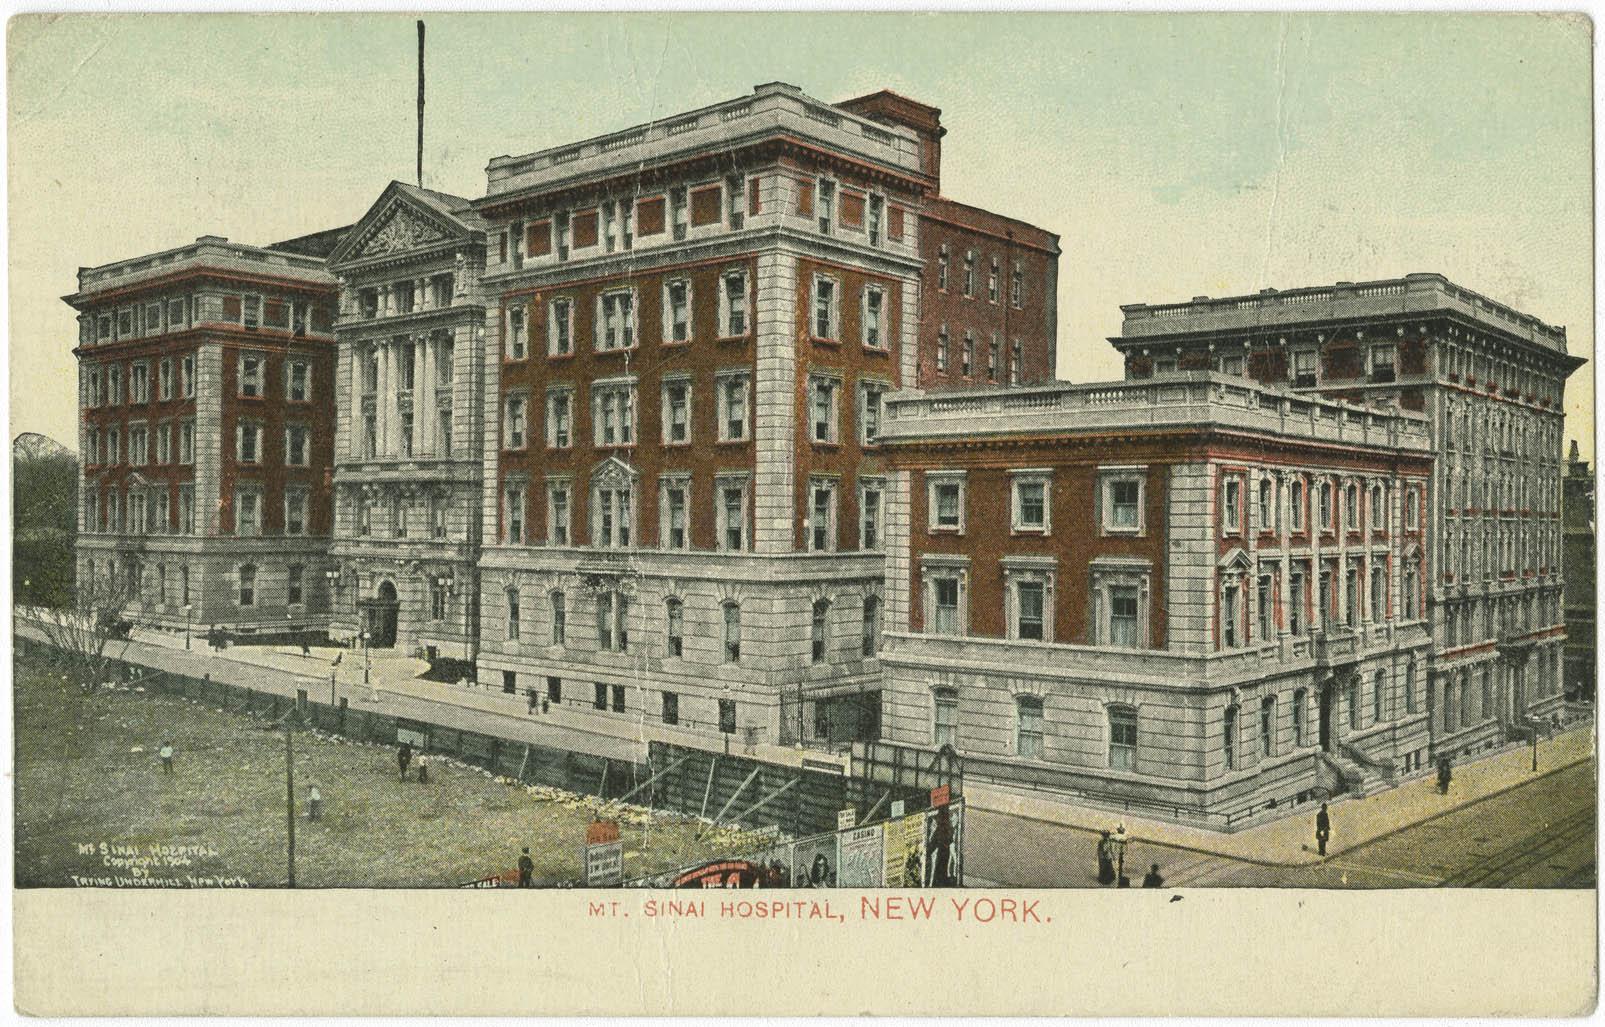 Mt. Sinai Hospital, New York